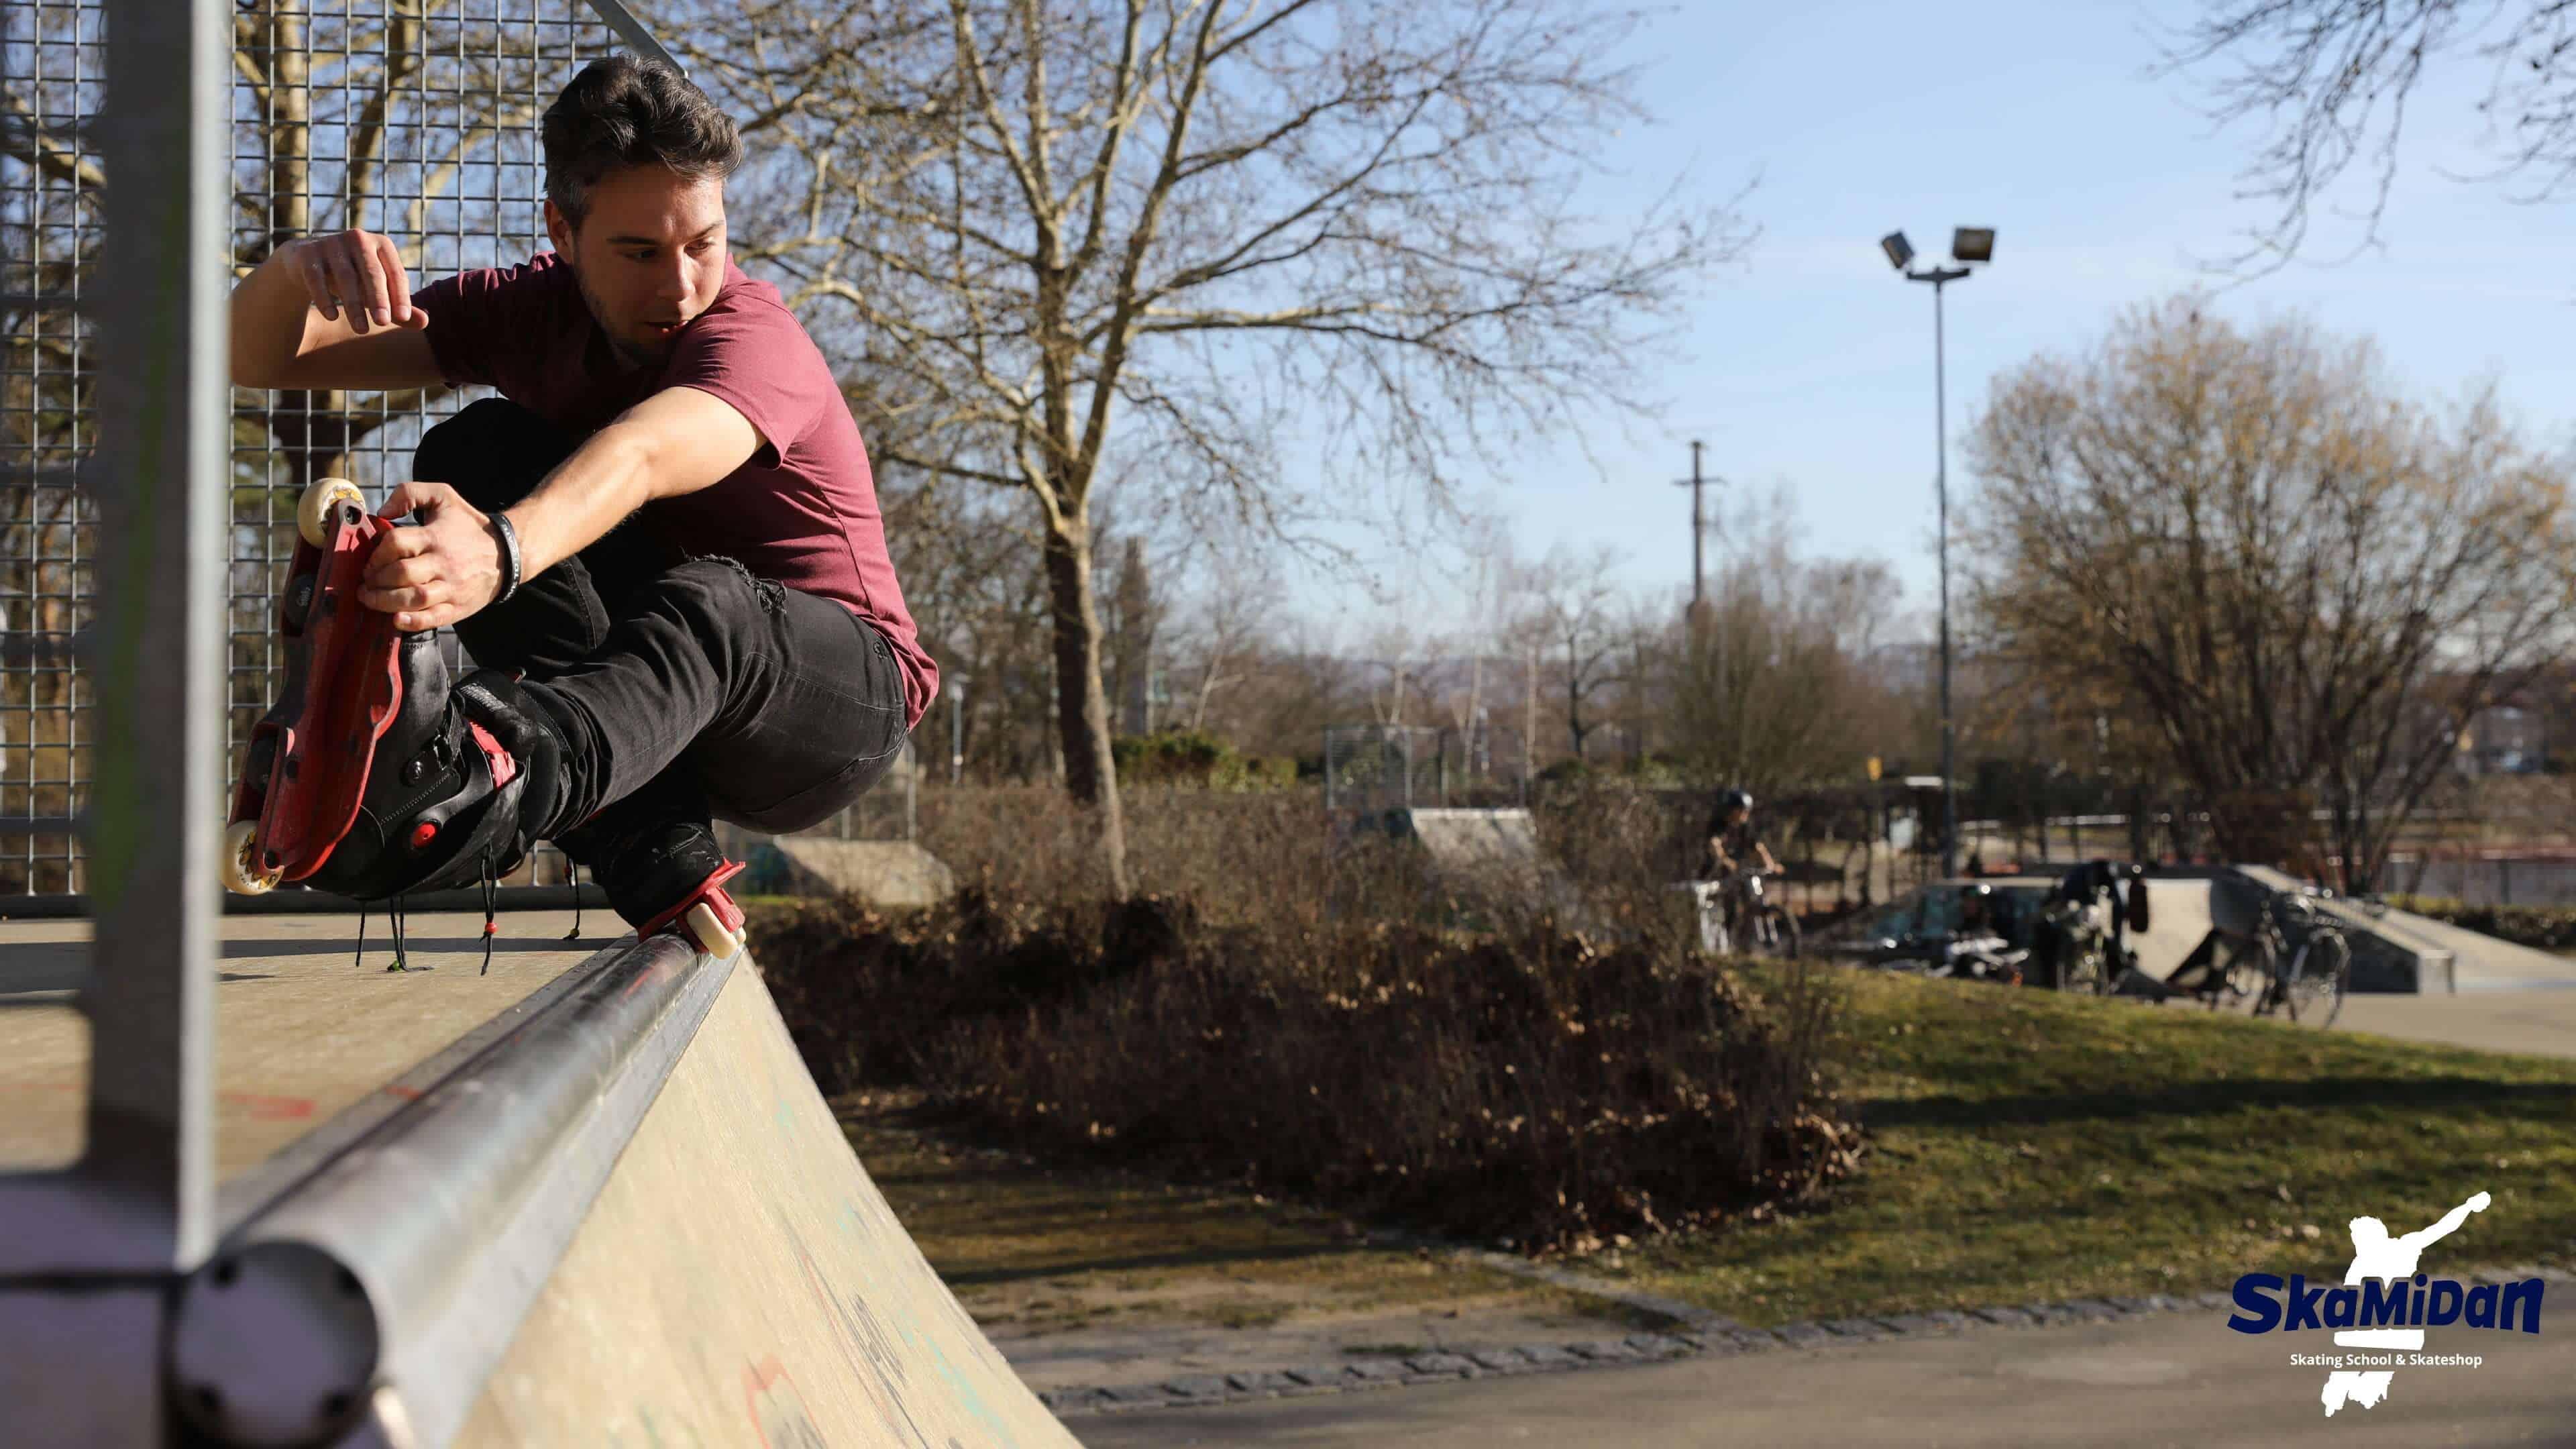 SkaMiDan's Trickliste des Aggressive Inline Skating Rocket Makio Grind